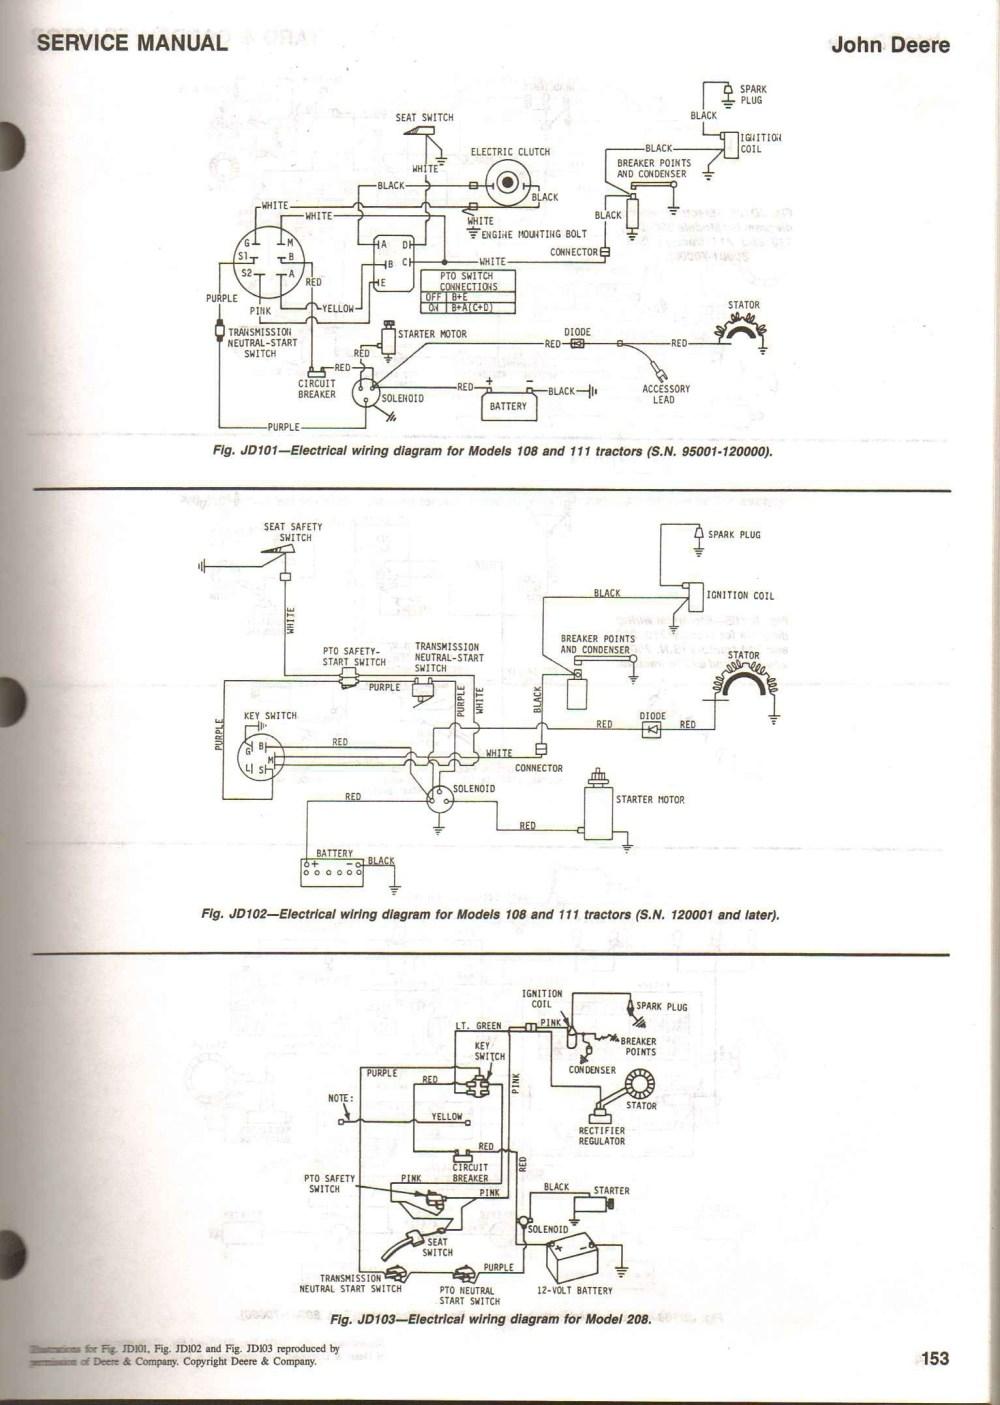 medium resolution of john deere gator 6x4 wiring diagram online wiring diagramjohn deere gator 6x4 wiring diagram free picture